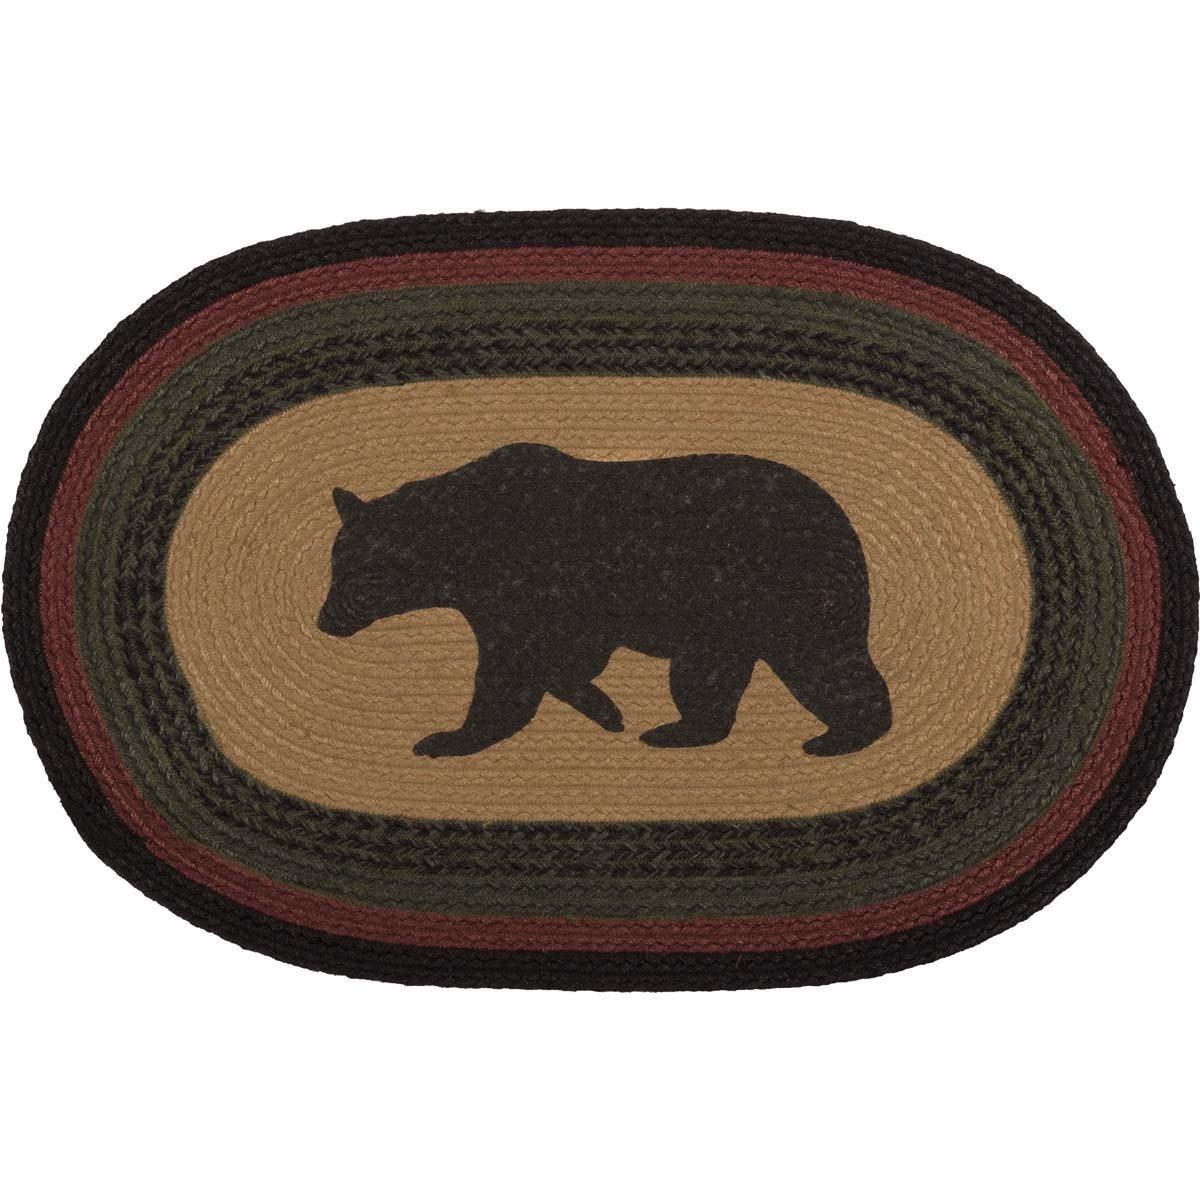 VHC Brands 38074 Rustic & Lodge Flooring-Wyatt Tan Bear Oval Jute Rug, 20 x 30